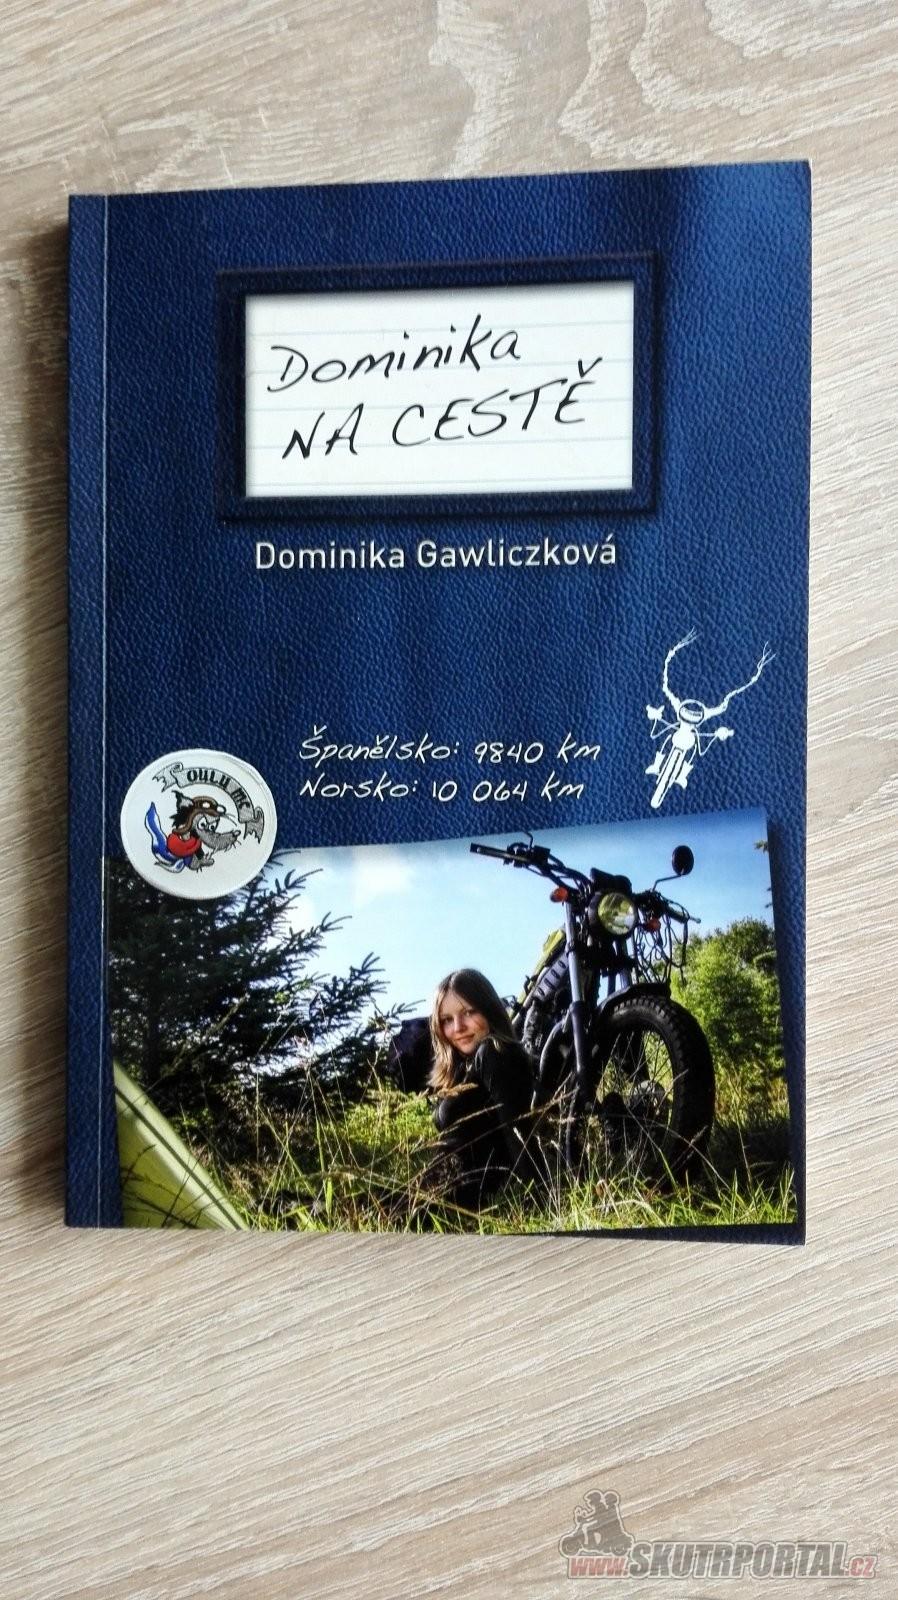 Dominika NA CESTĚ aneb vyhrajte cestopis od Dominiky Gawliczkové